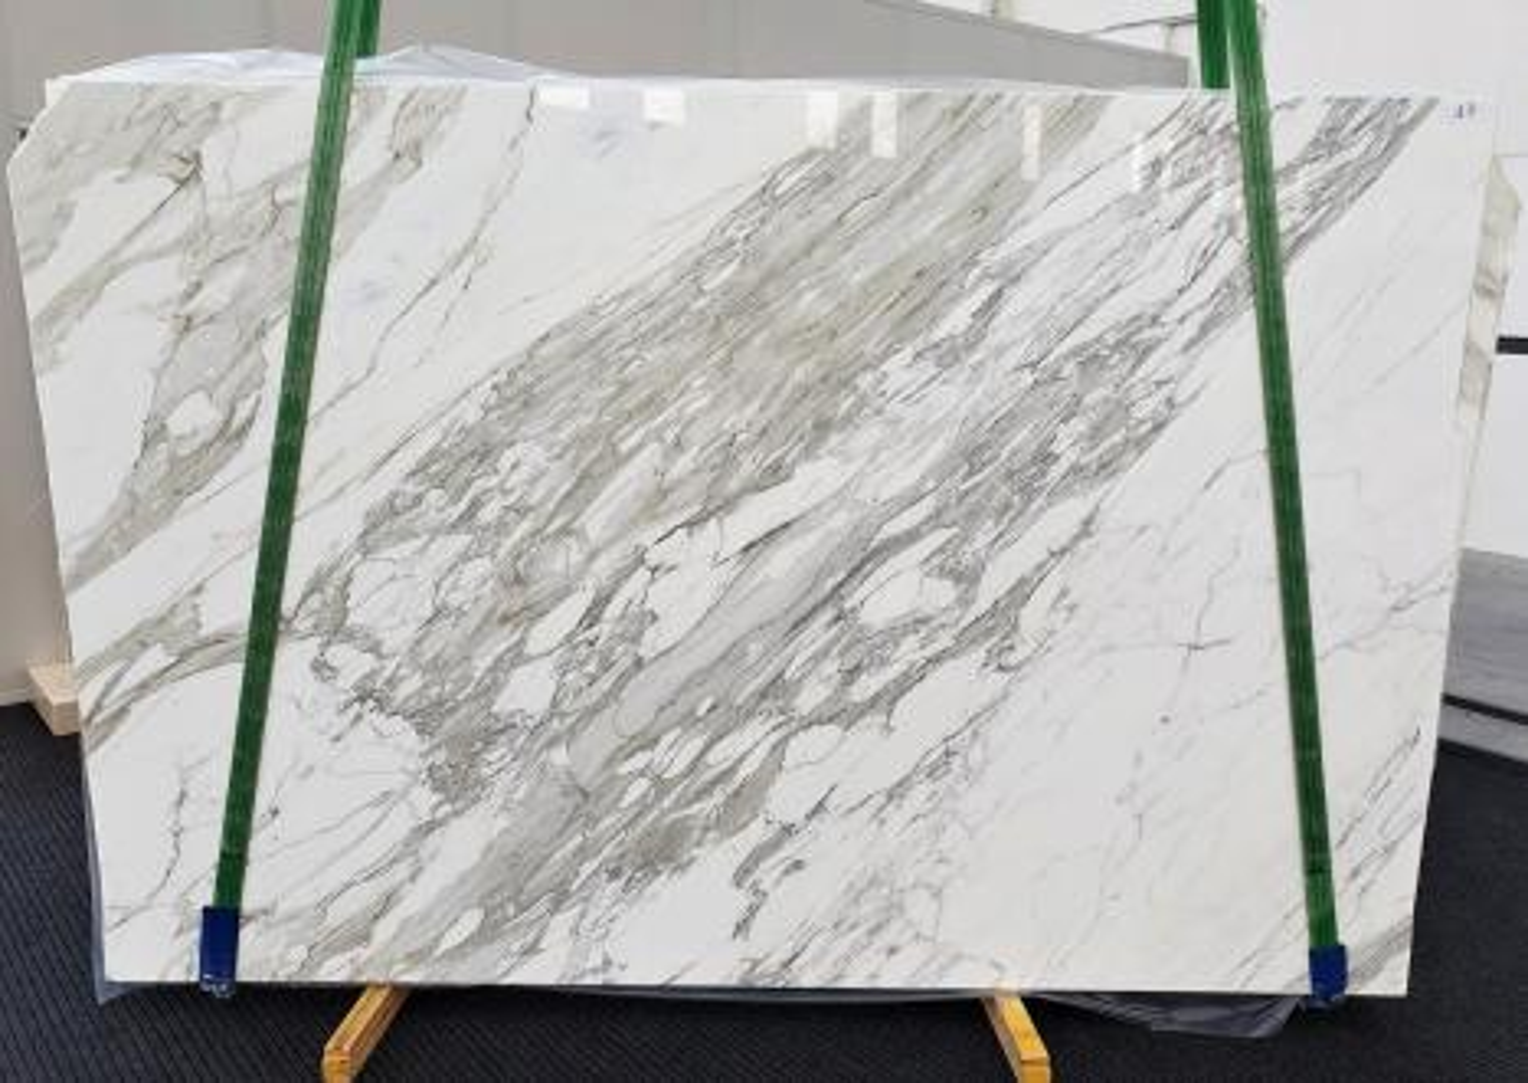 CALACATTA Supply Veneto (Italy) polished slabs 1344 , C - slab #17 natural marble